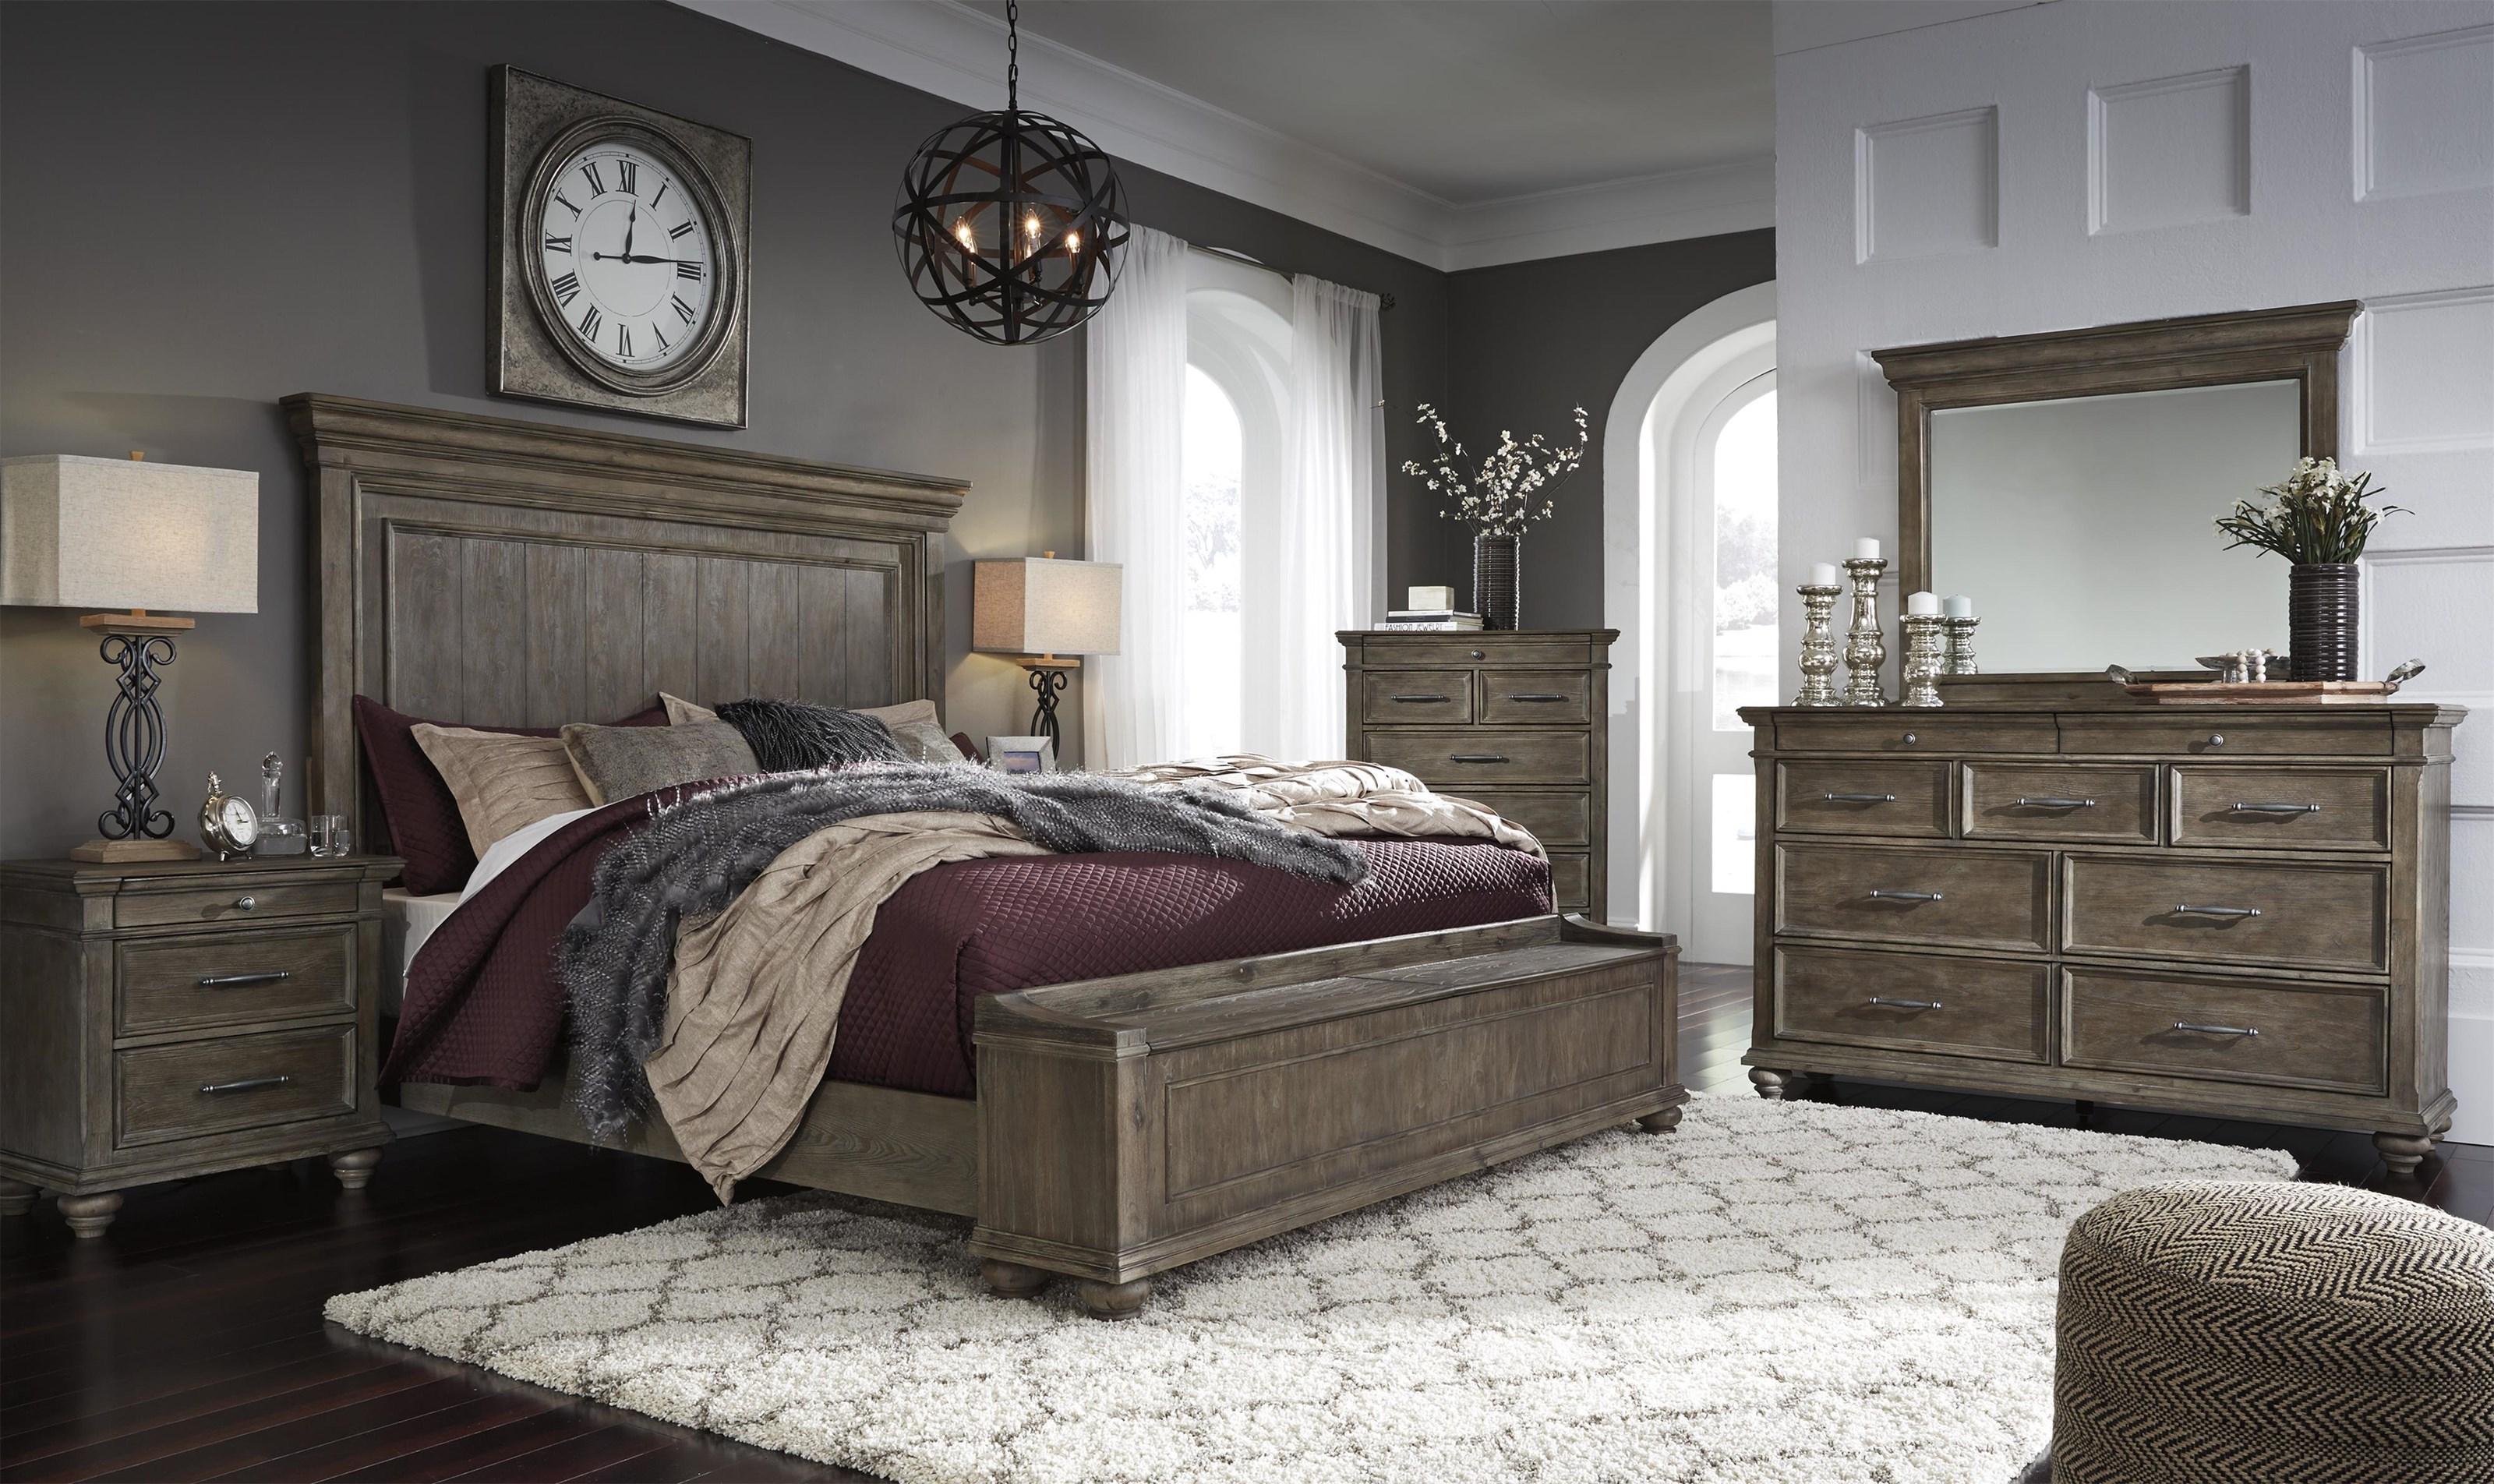 Johnelle 6 Piece Queen Panel Bedroom Set by Millennium at Sam Levitz Outlet